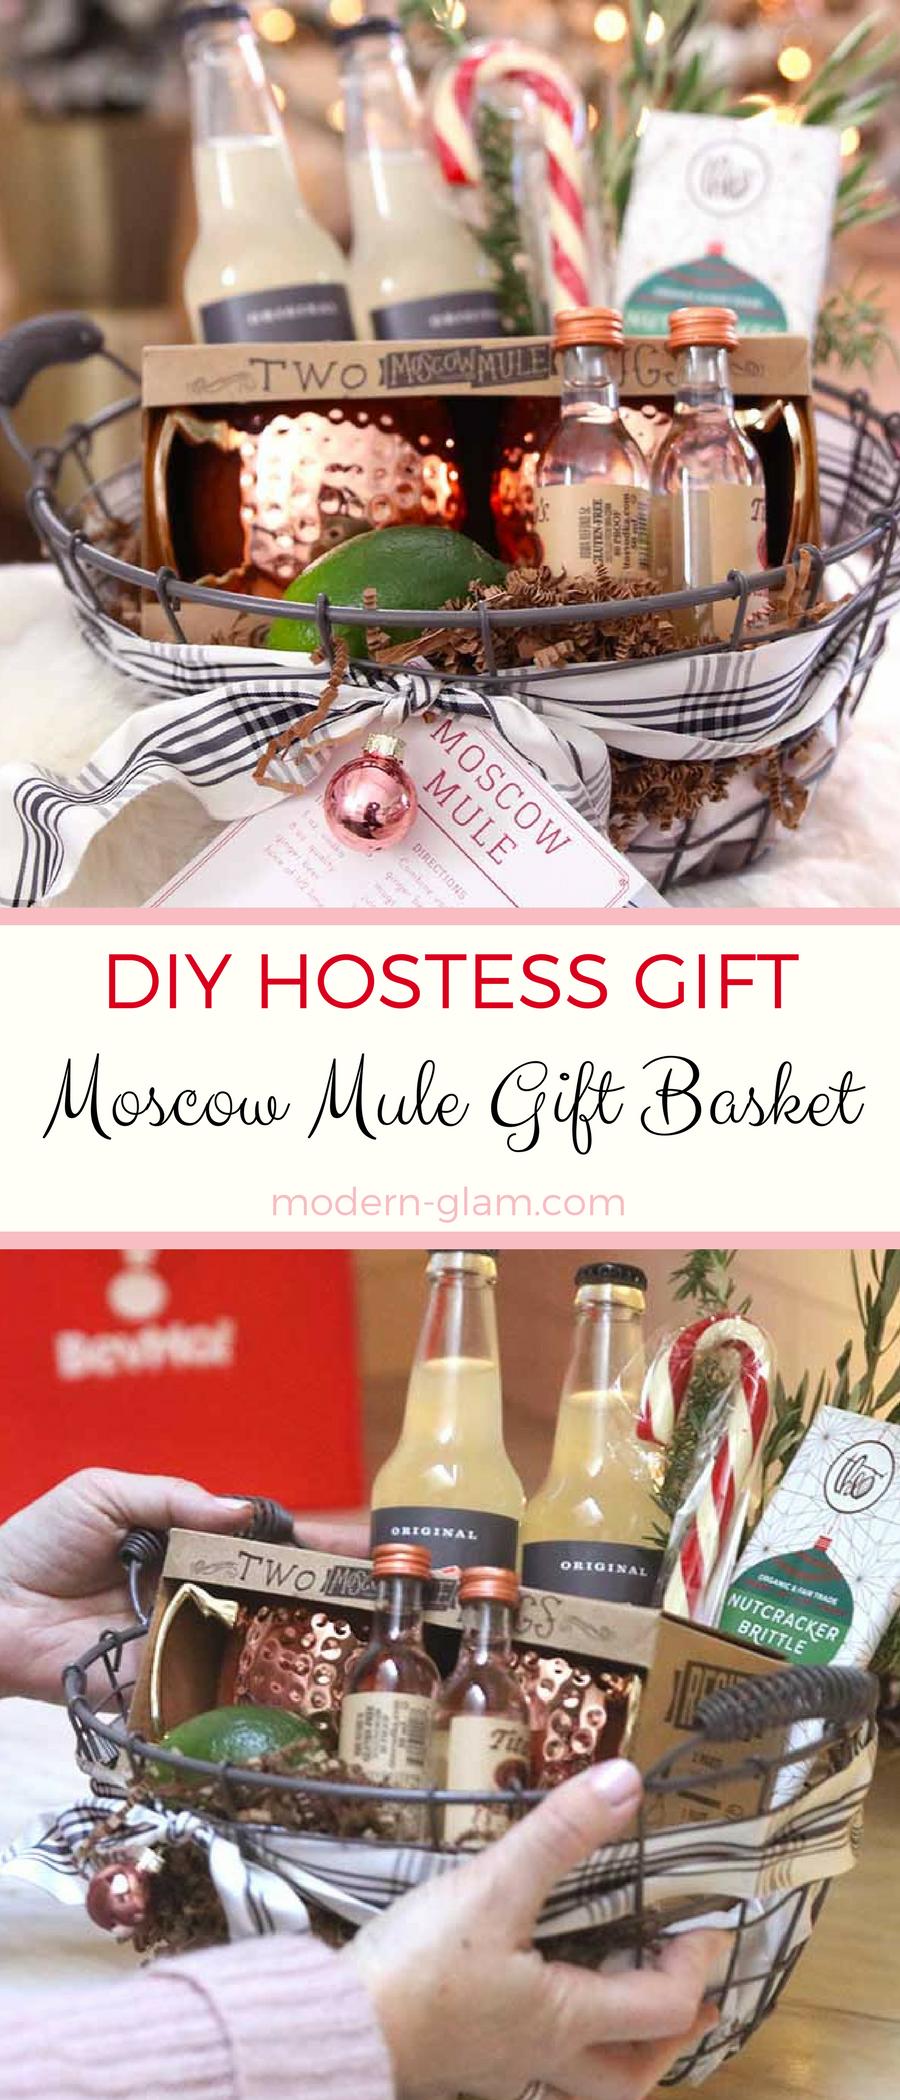 DIY hostess gift: Moscow Mule Gift Basket - Modern Glam